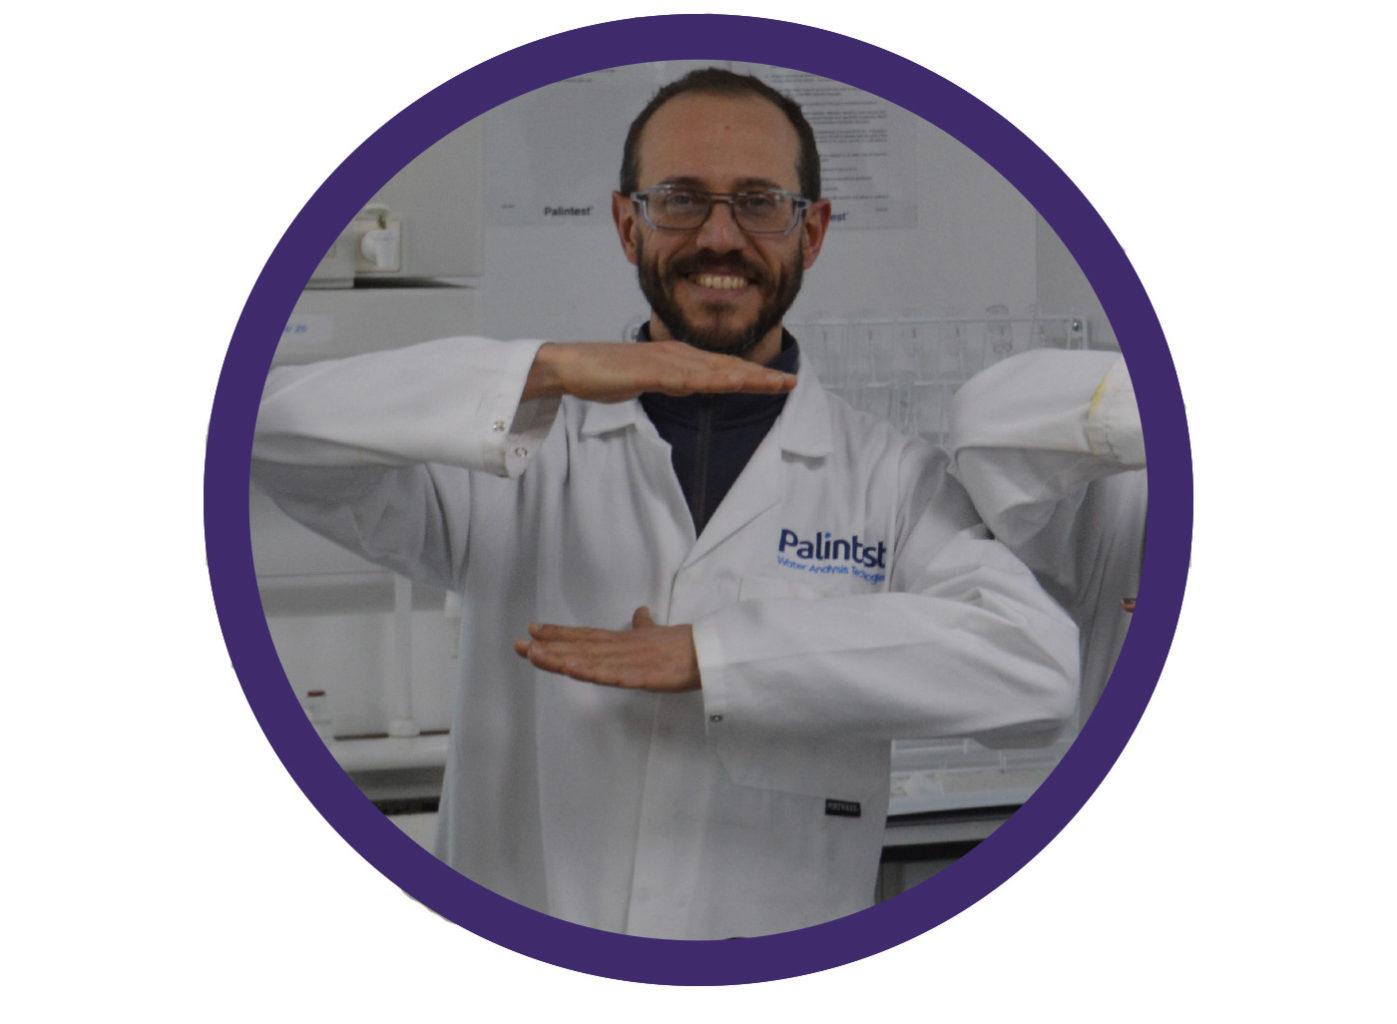 <h3>Antonio, R&D Chemistry Manager </h3>